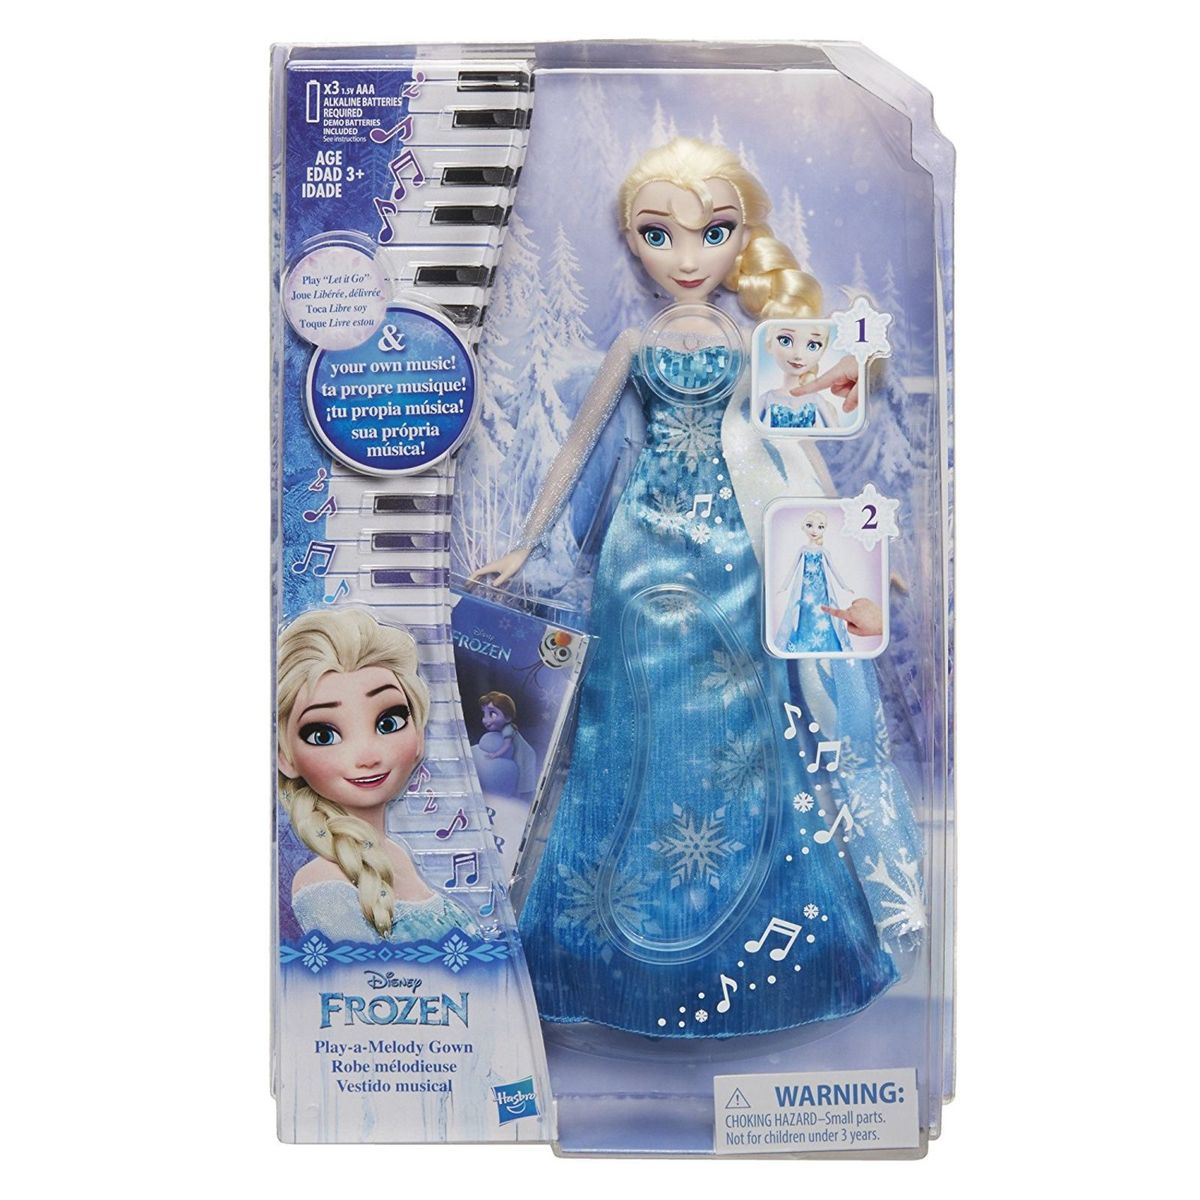 d0faaedced Boneca Frozen Elsa Vestido Mágico Musical Lançamento Importada ...